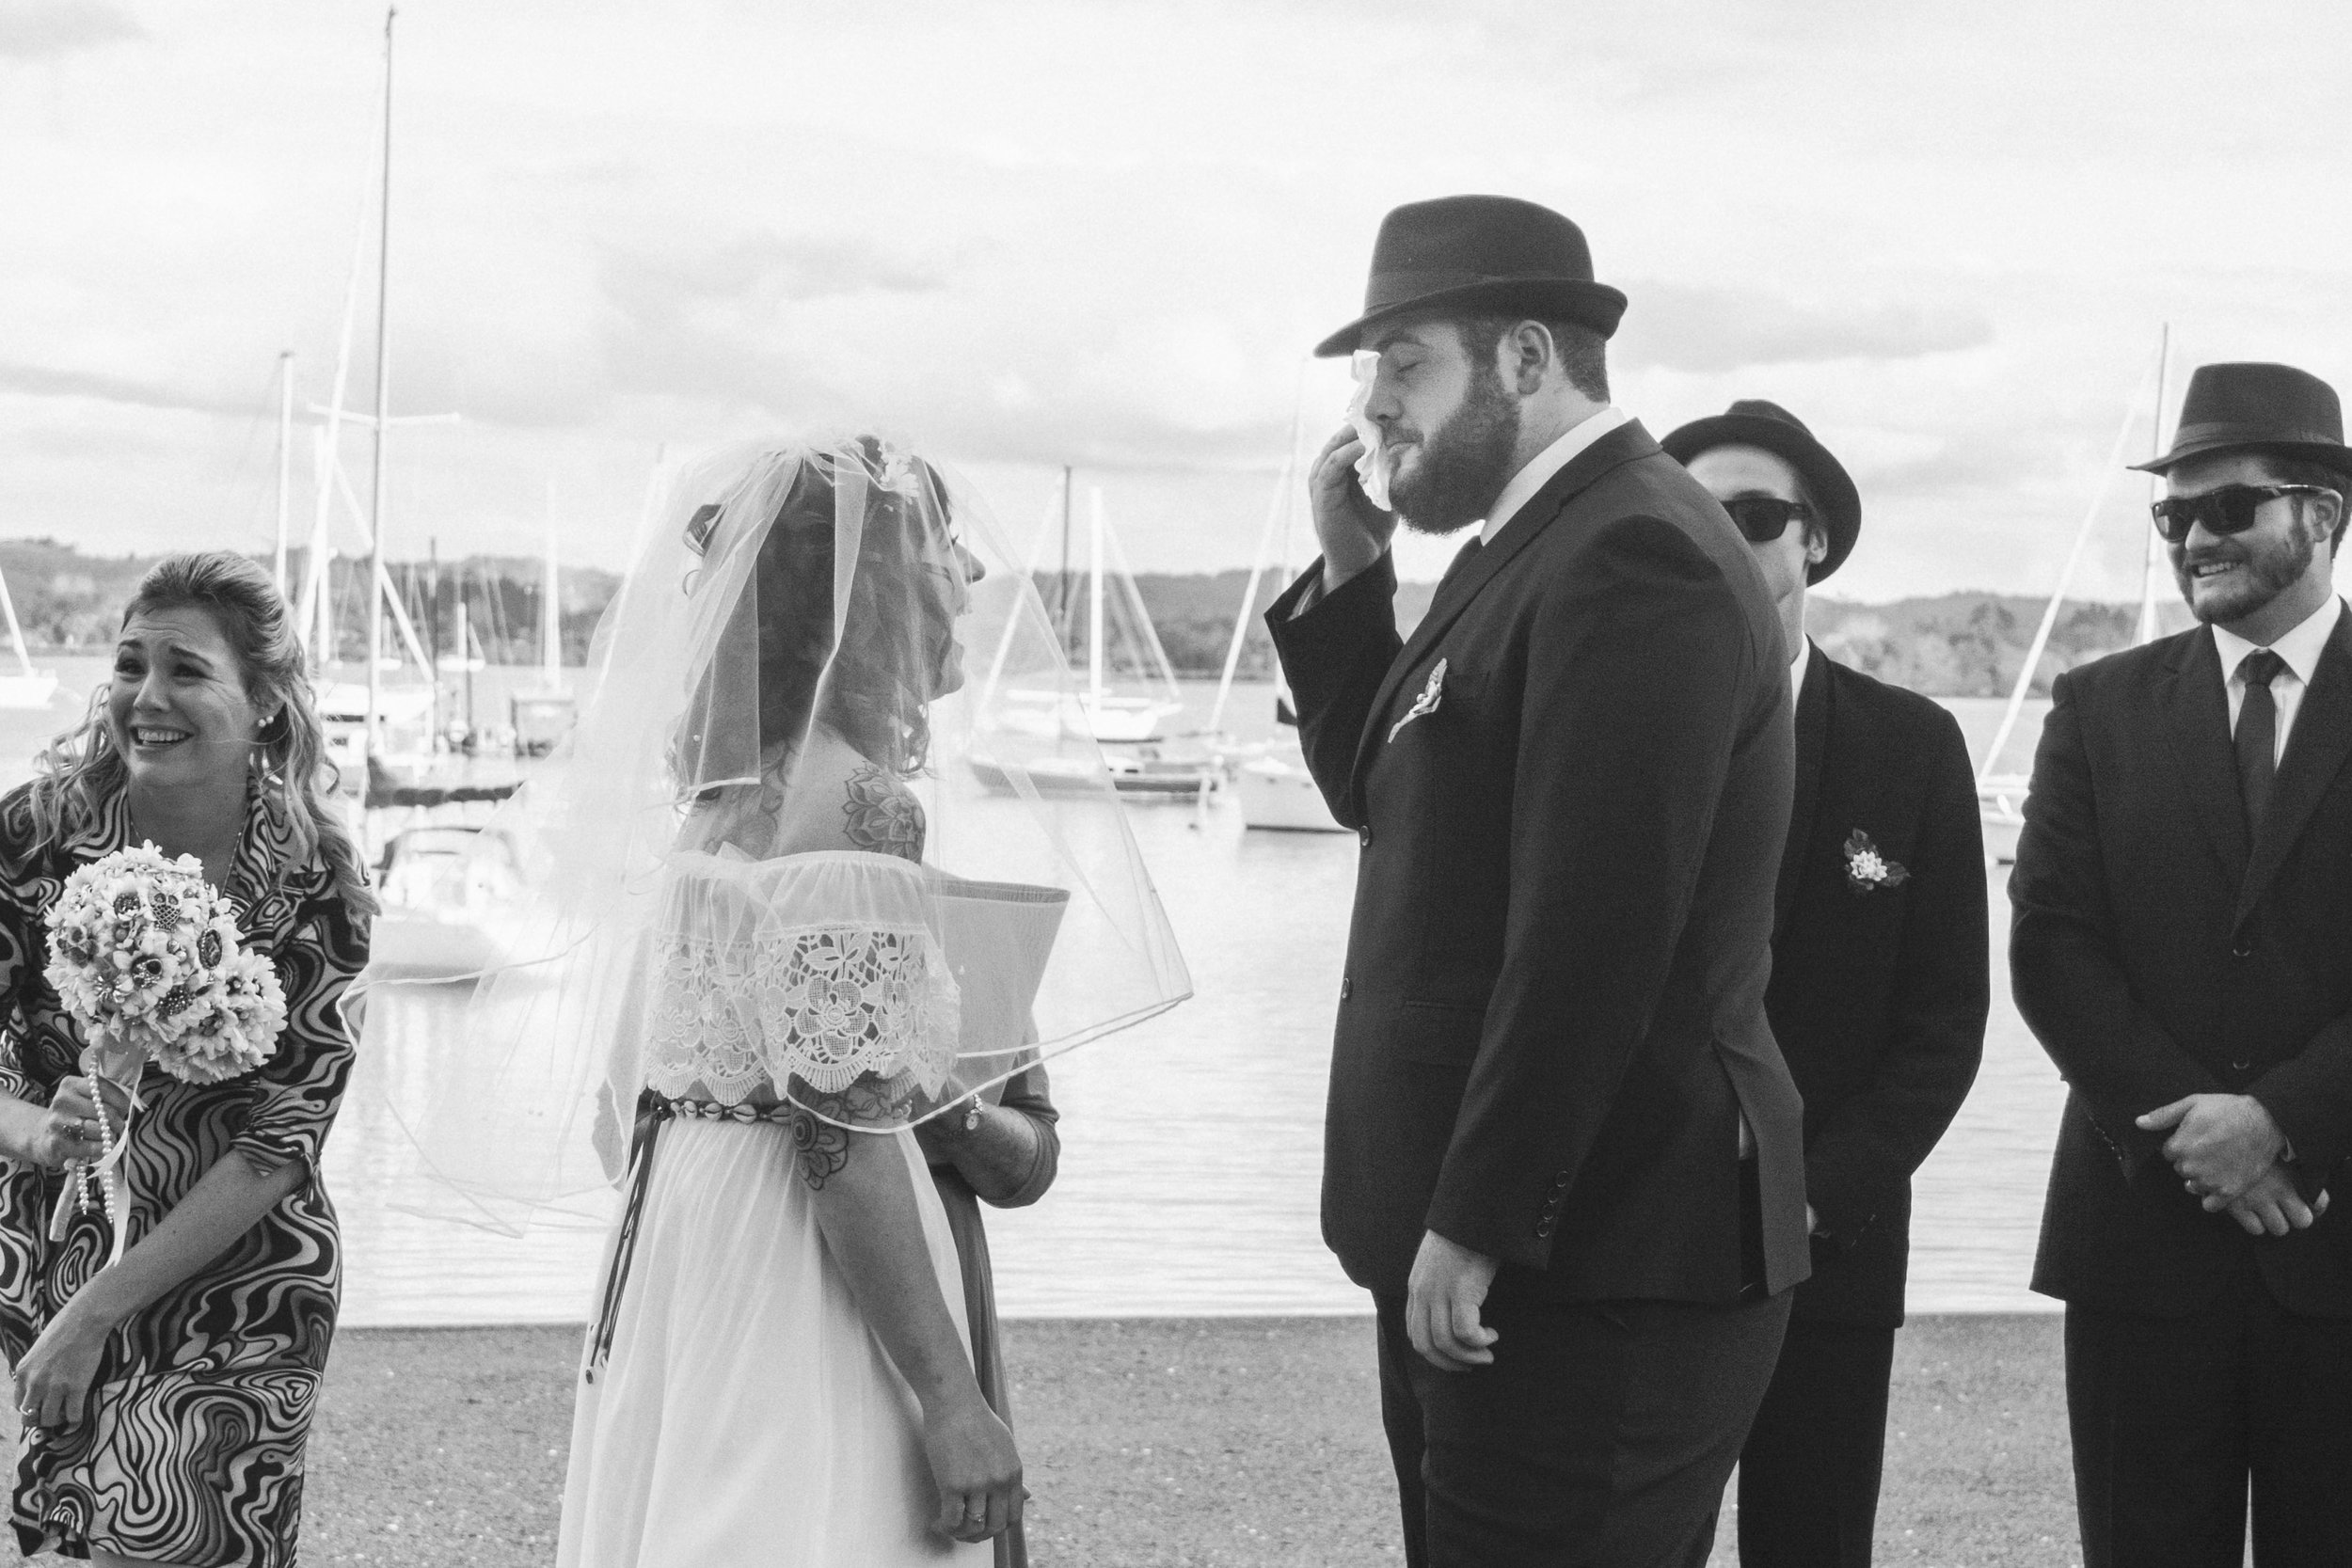 Happy-tears-on-wedding-day